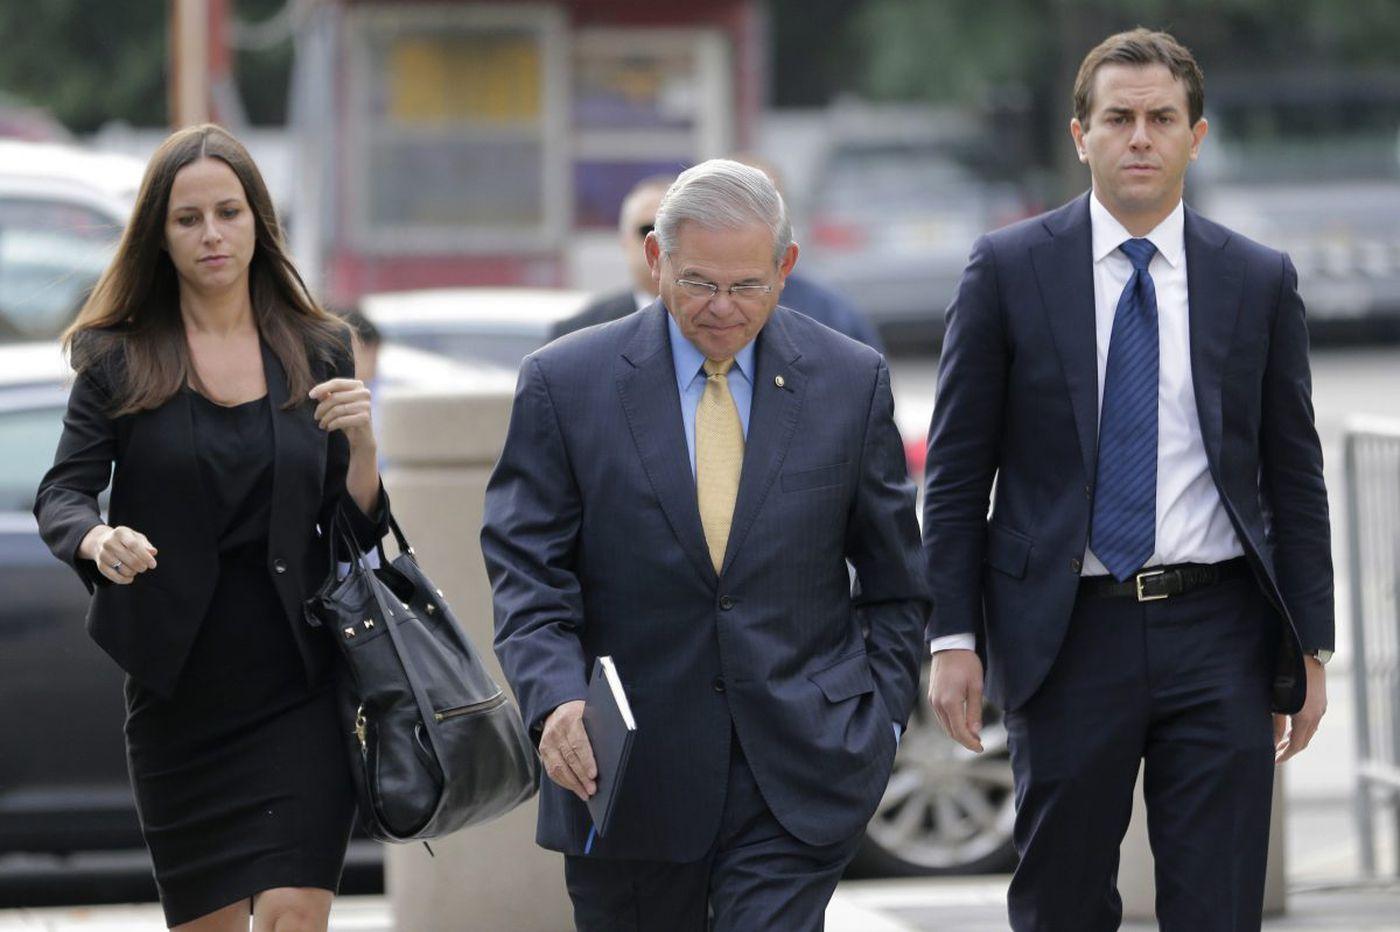 Judge warns Feds against 'pulp fiction' in Sen. Bob Menendez bribery trial